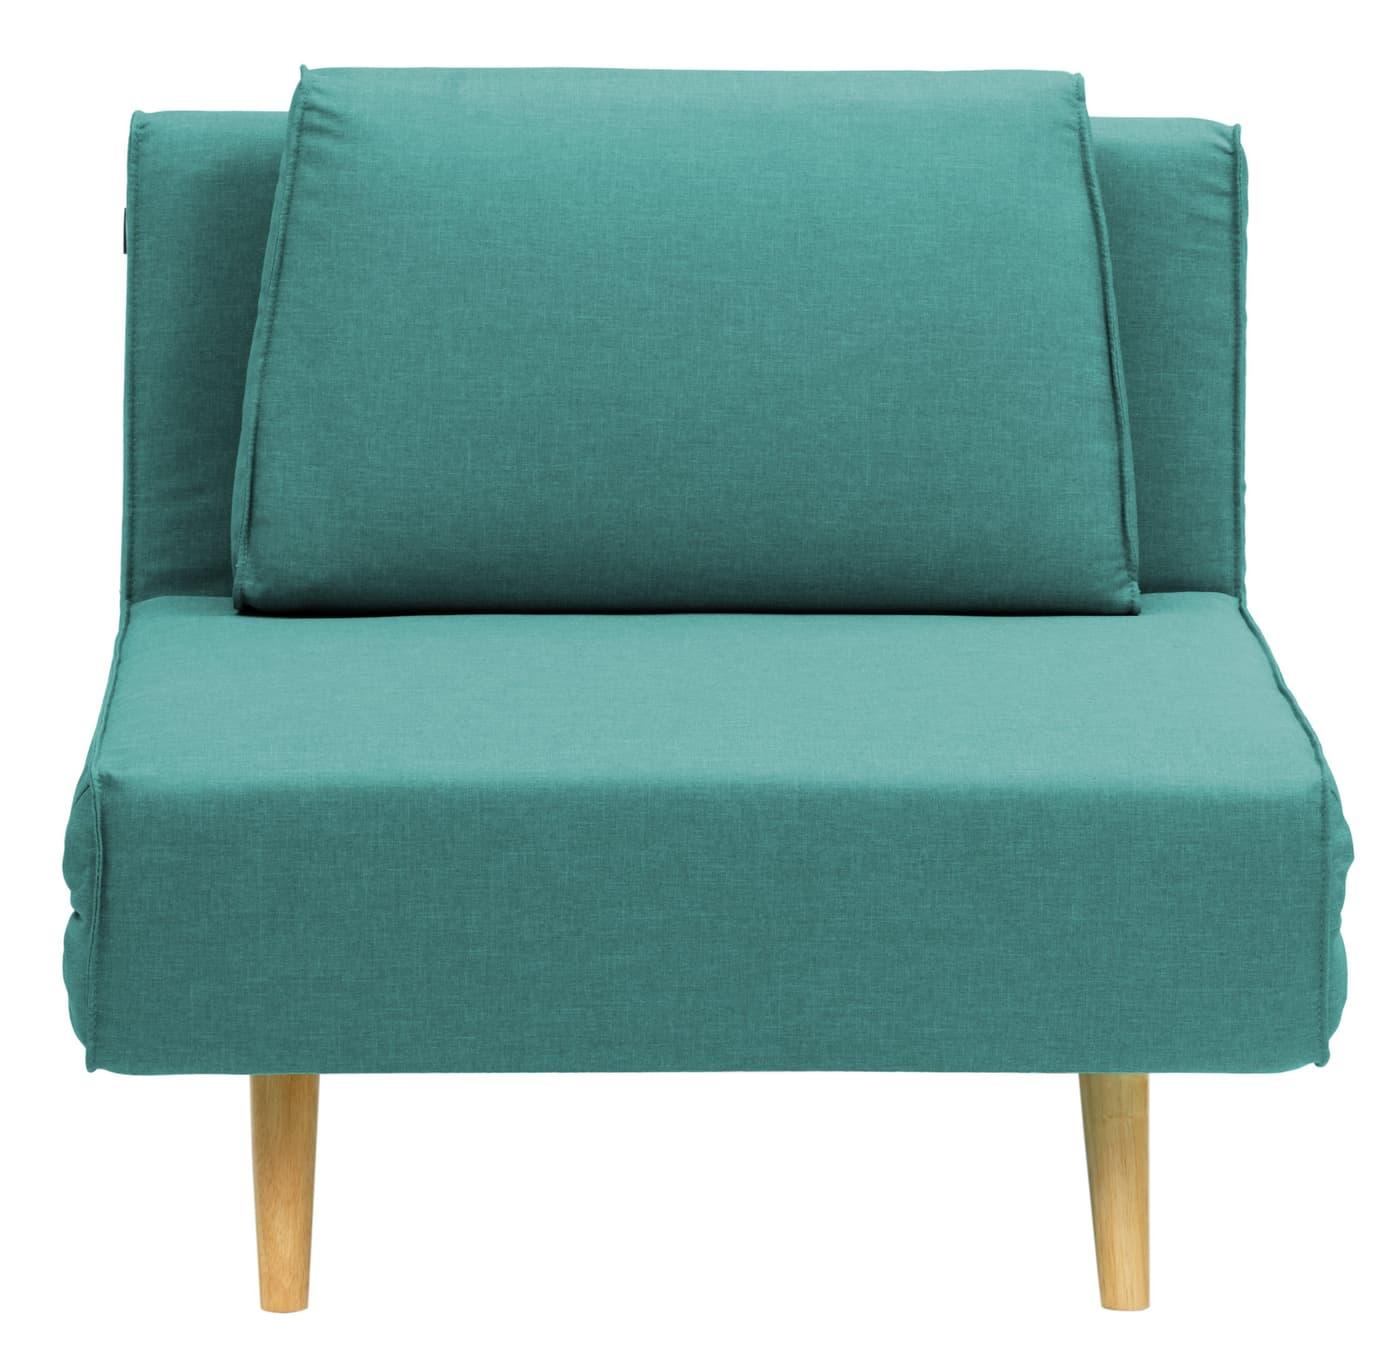 Canap lit henni migros for Migros meubles